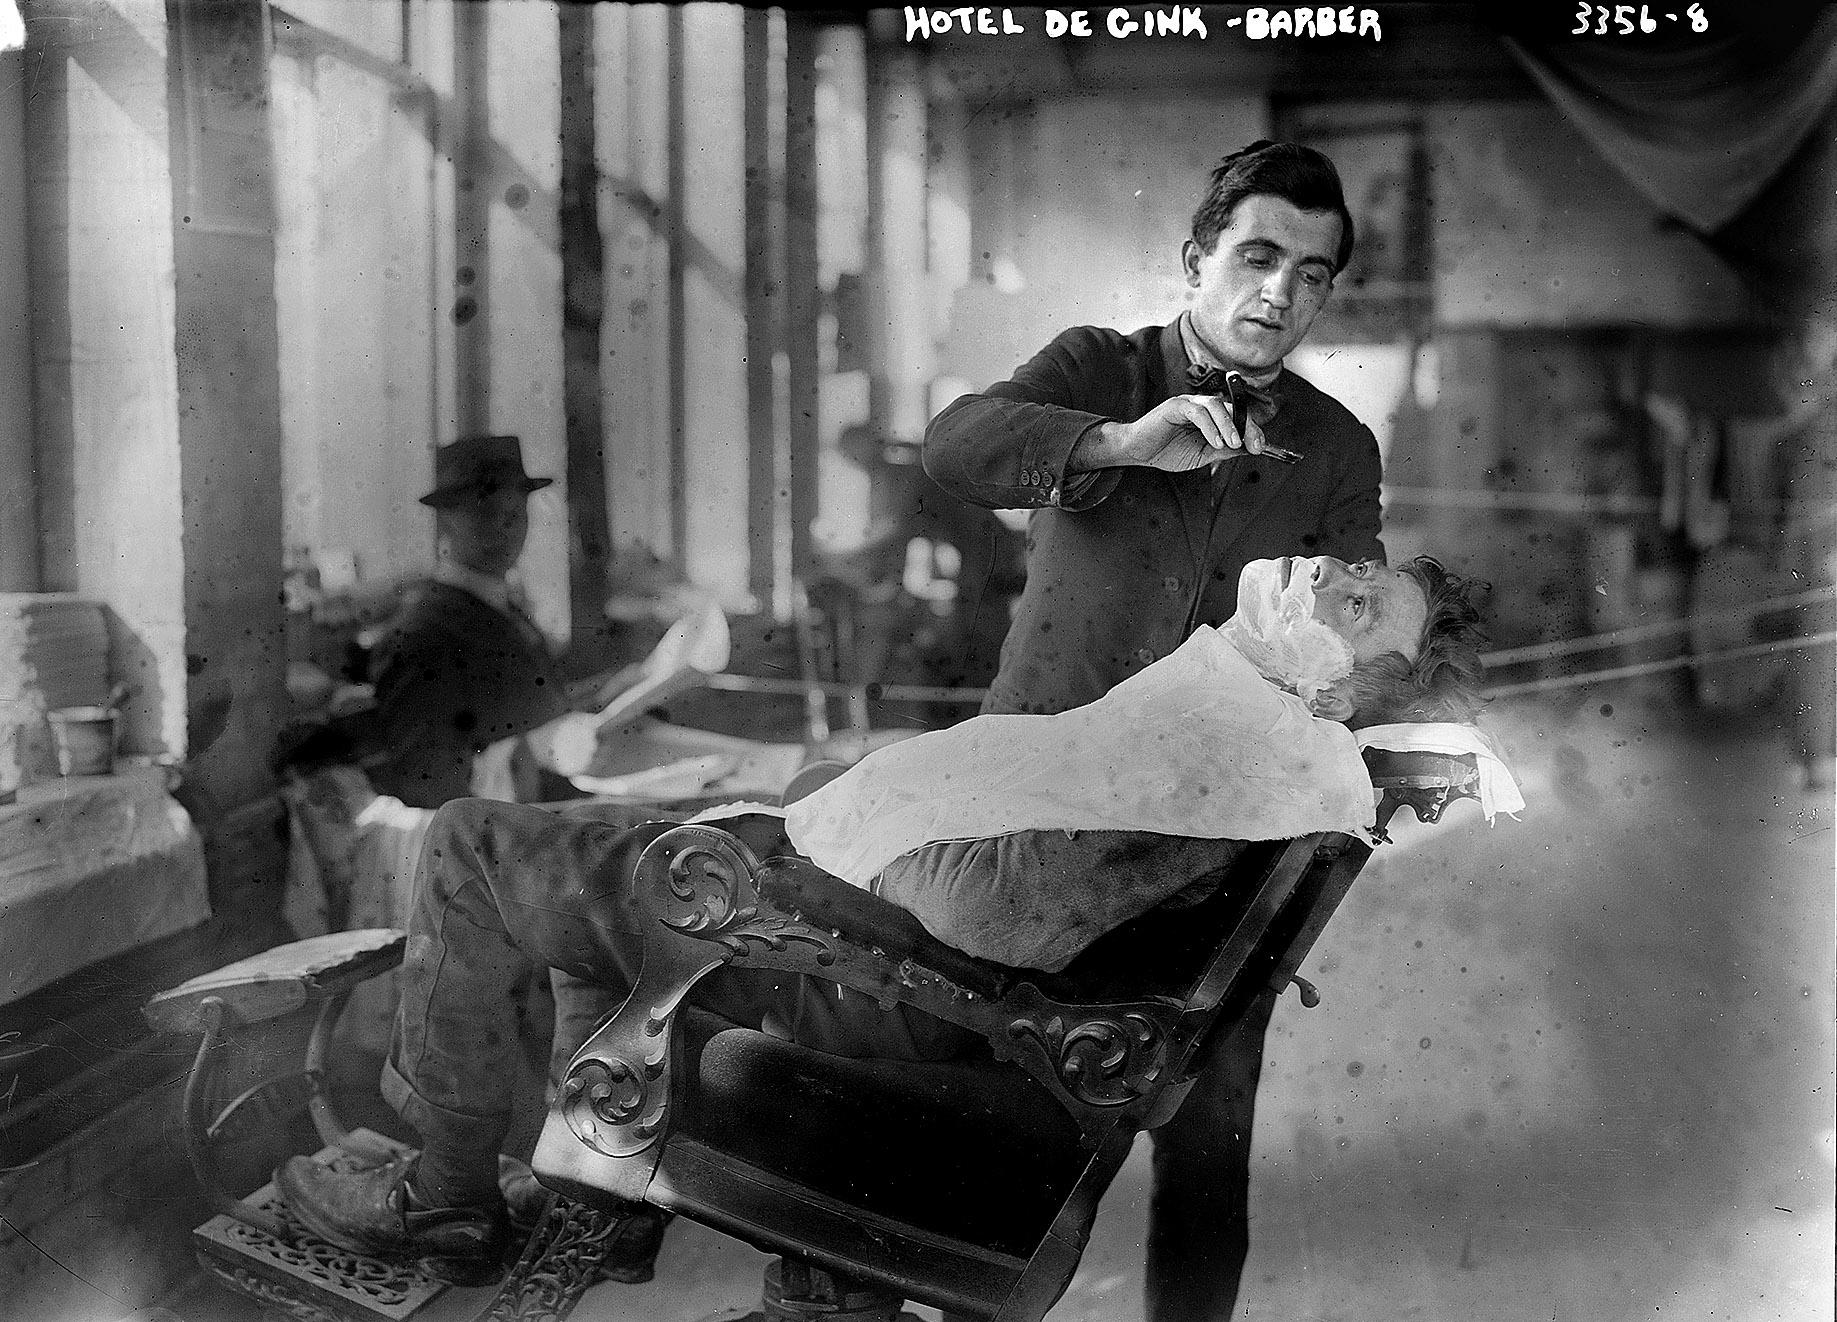 barber-loc-18192u